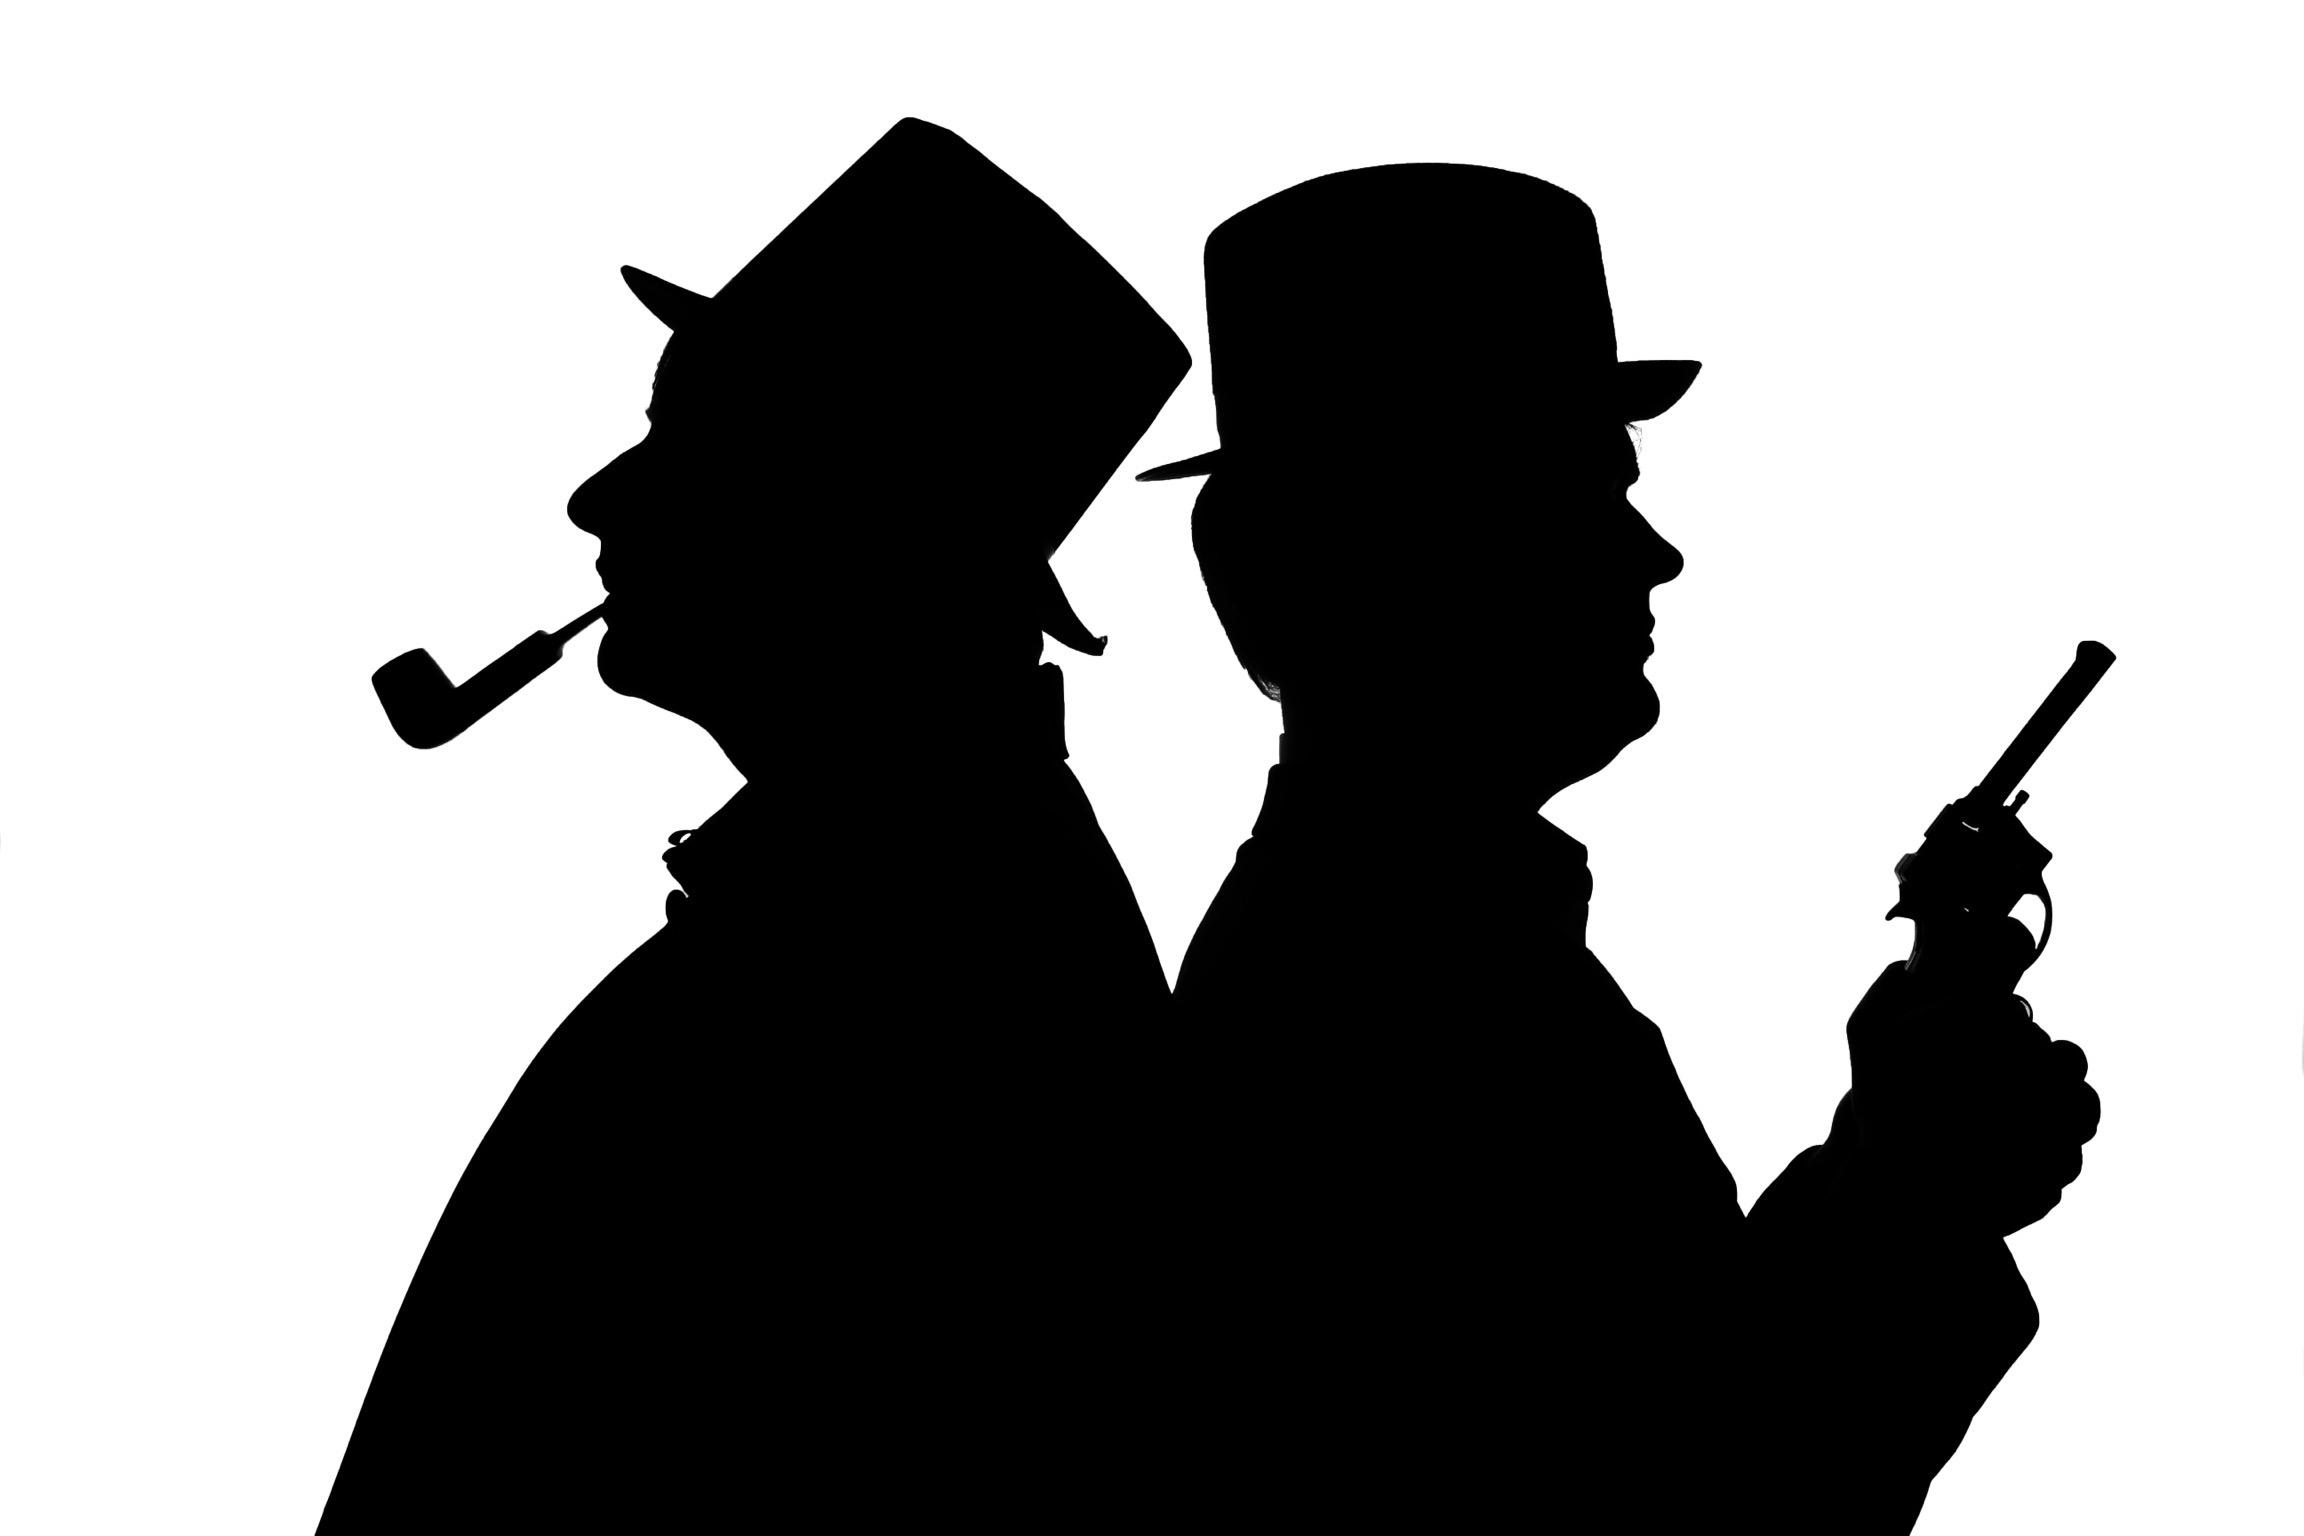 2304x1536 Sherlock Holmes And Doctor Watson Silhouette Profile Sh